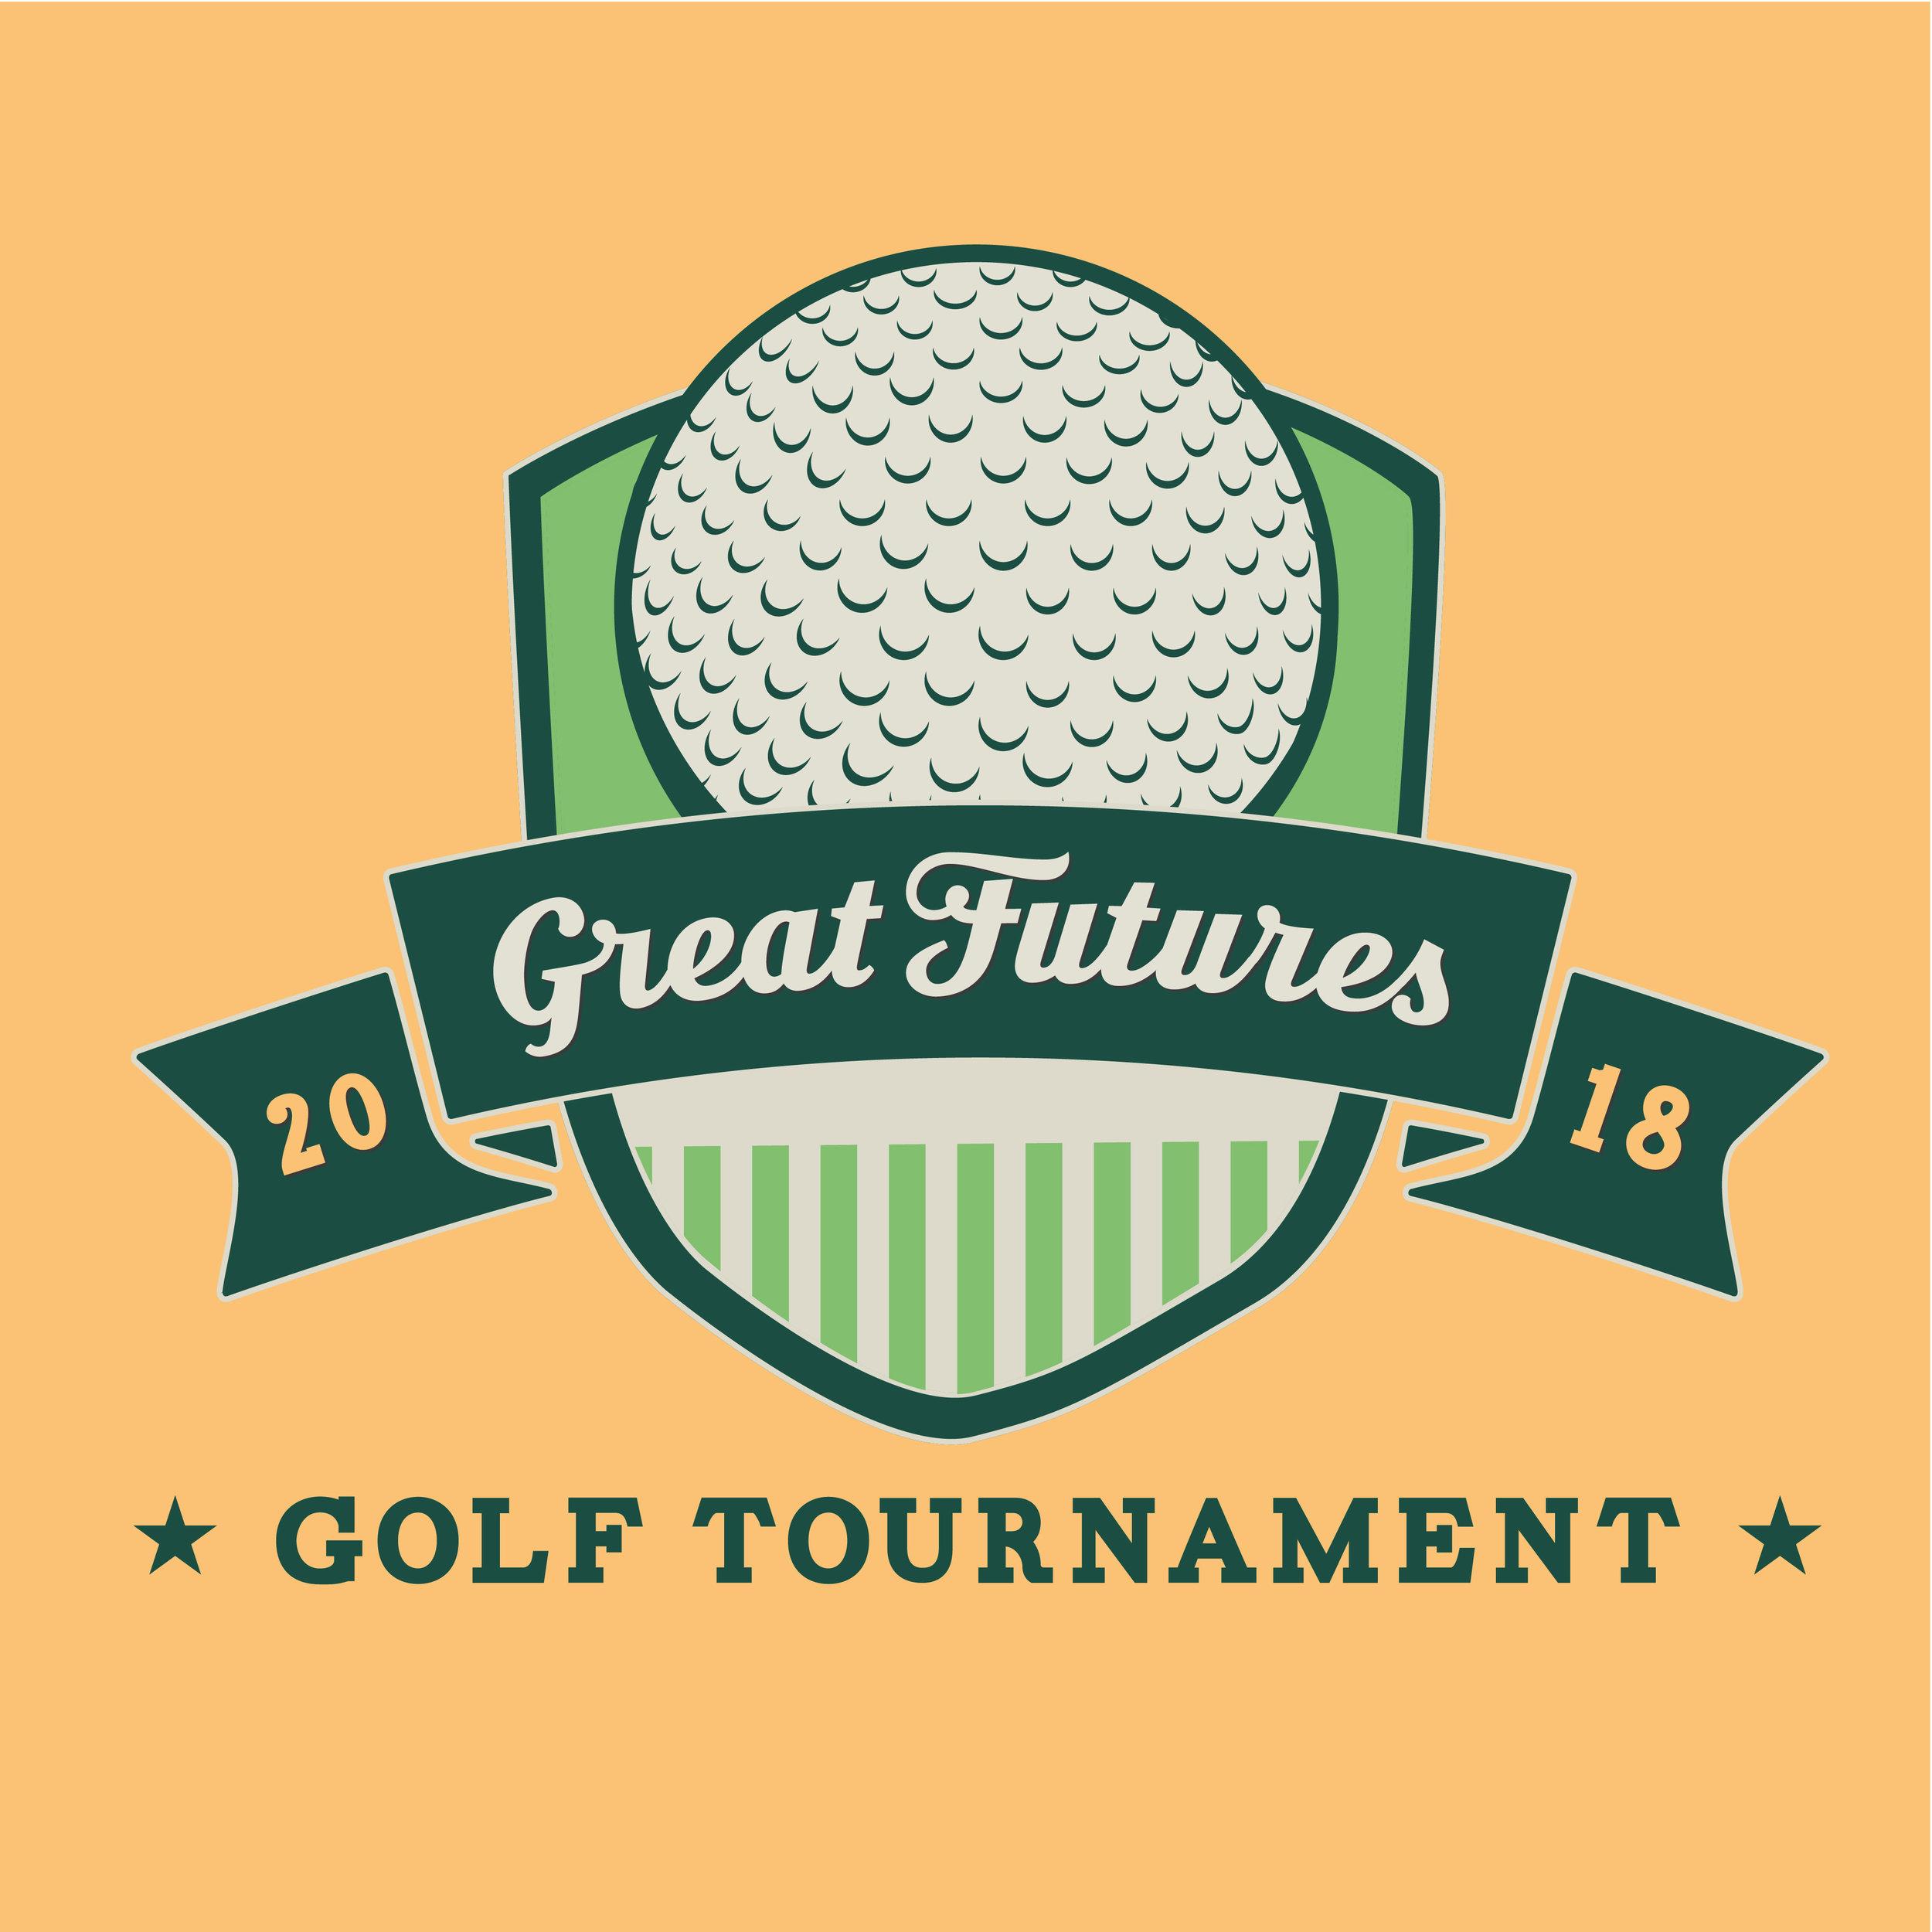 Great Futures logo 2018-20.jpg